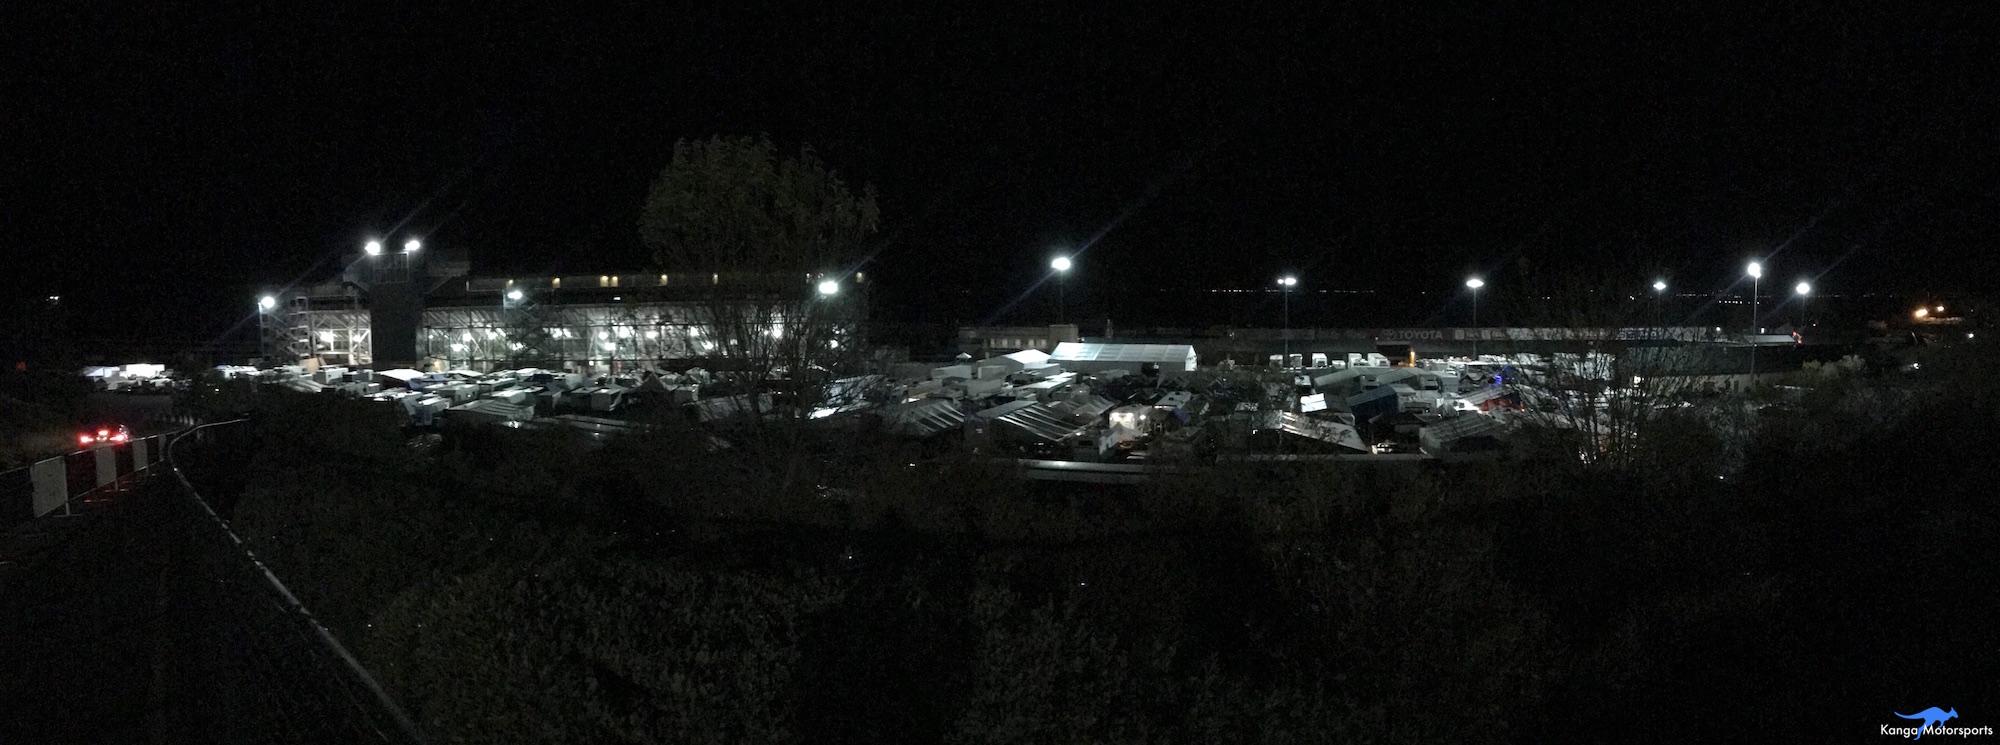 Kanga Motorsports SCCA Runoffs Spec Racer Ford Gen3 Sonoma Raceway Paddock at Night.JPG